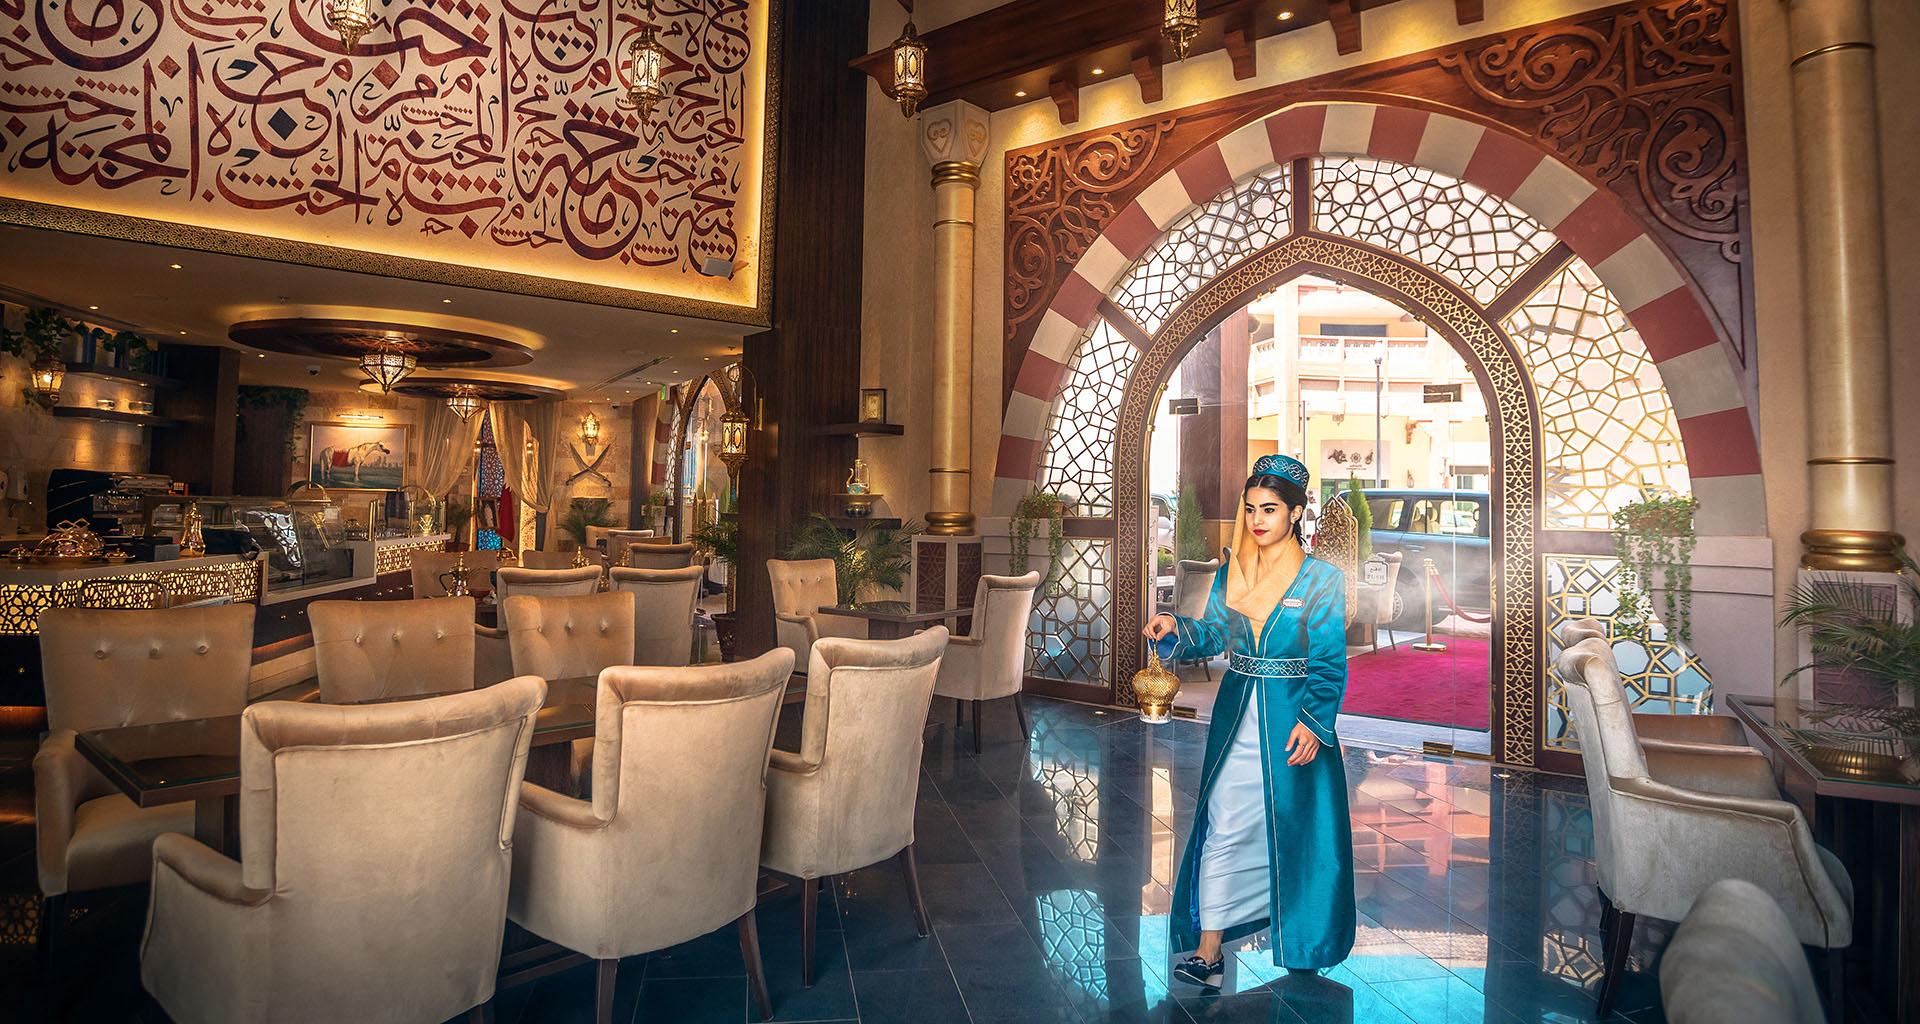 , TAMARI, YASMINE PALACE - مطعم قصر الياسمين, YASMINE PALACE - مطعم قصر الياسمين